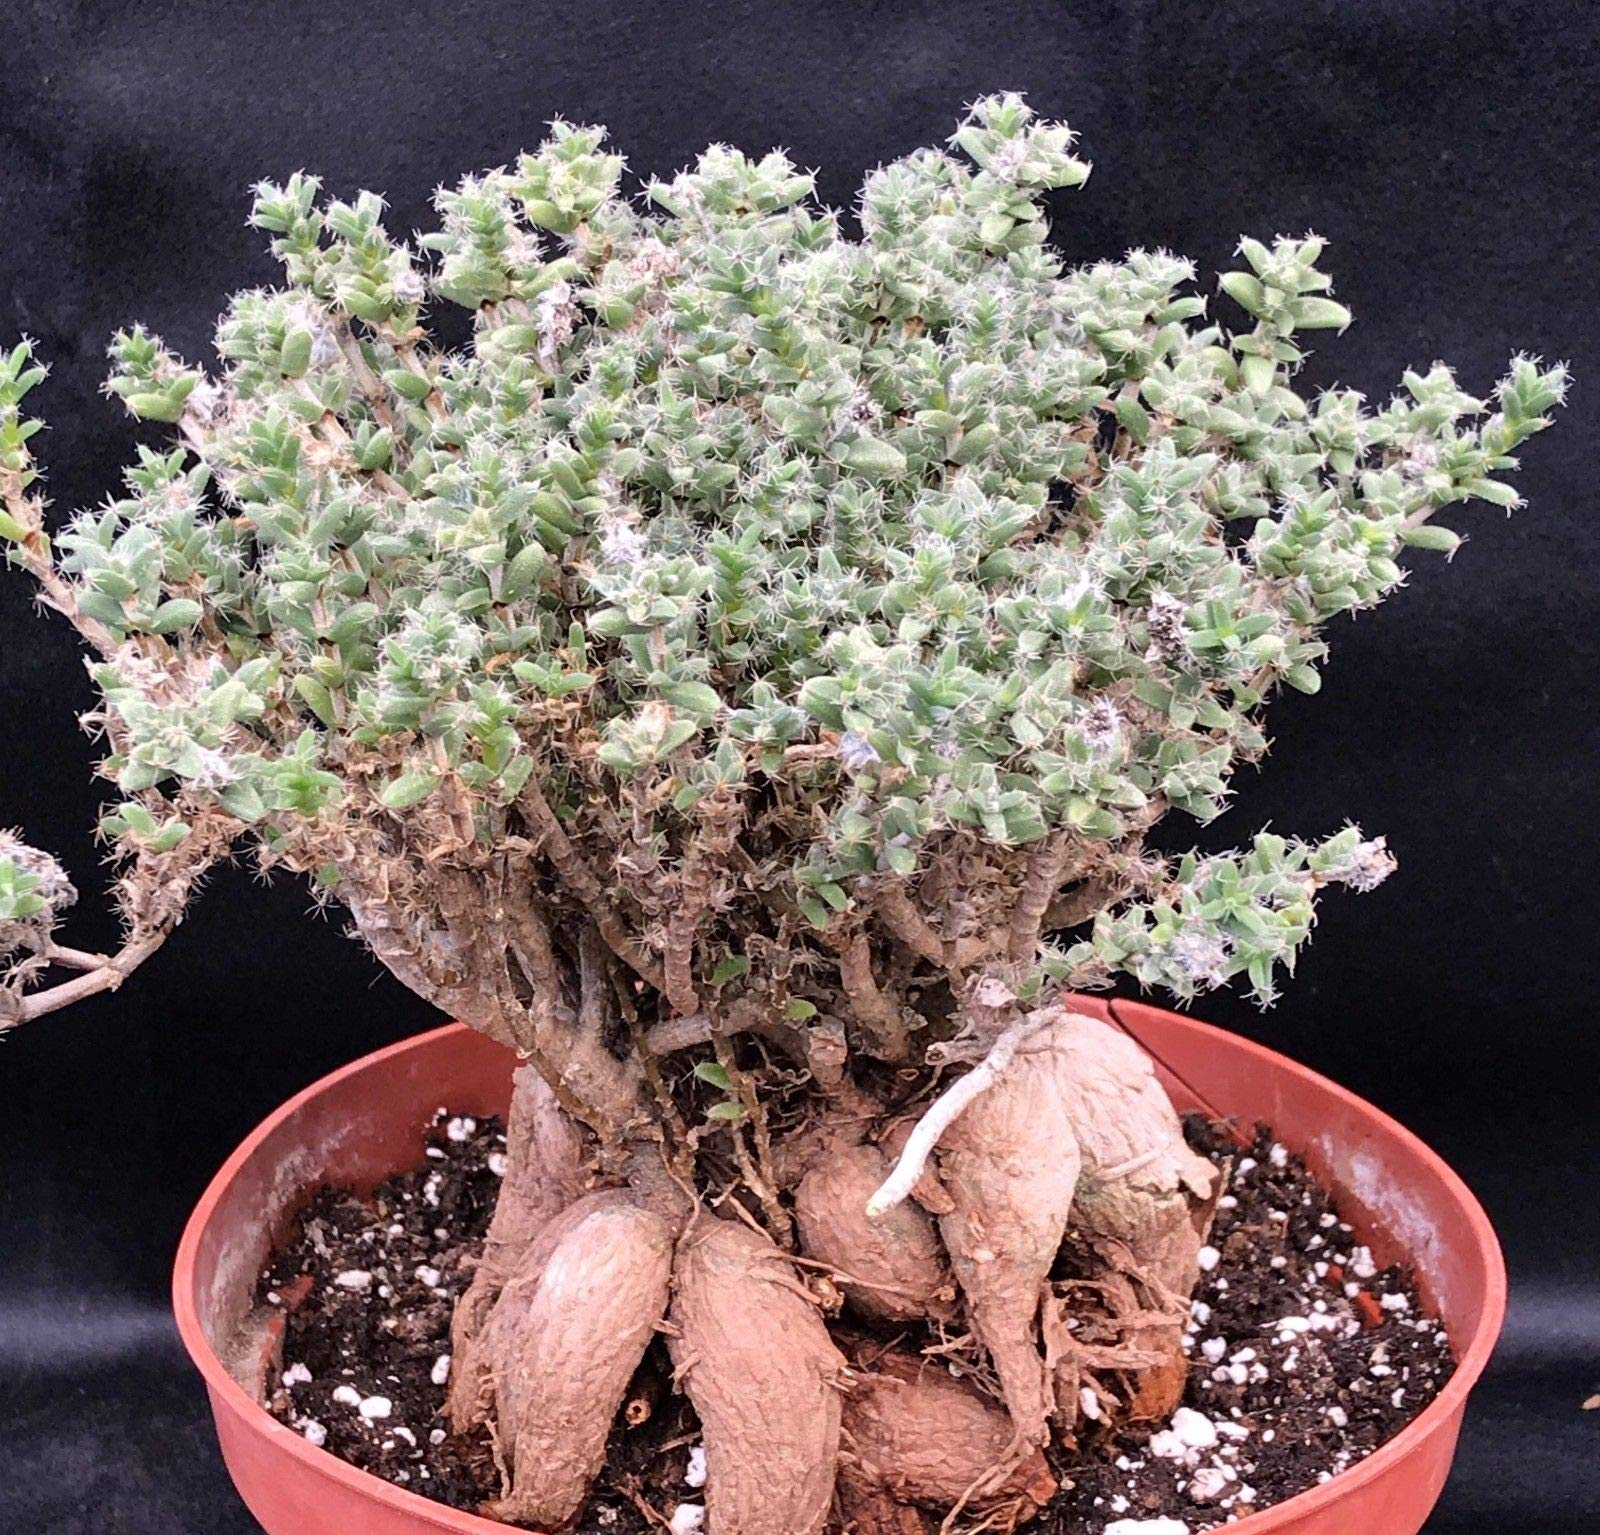 Trichodiadema Bulbosum Caudex Succulent Ice Plant African Bonsai Houseplant #DV01